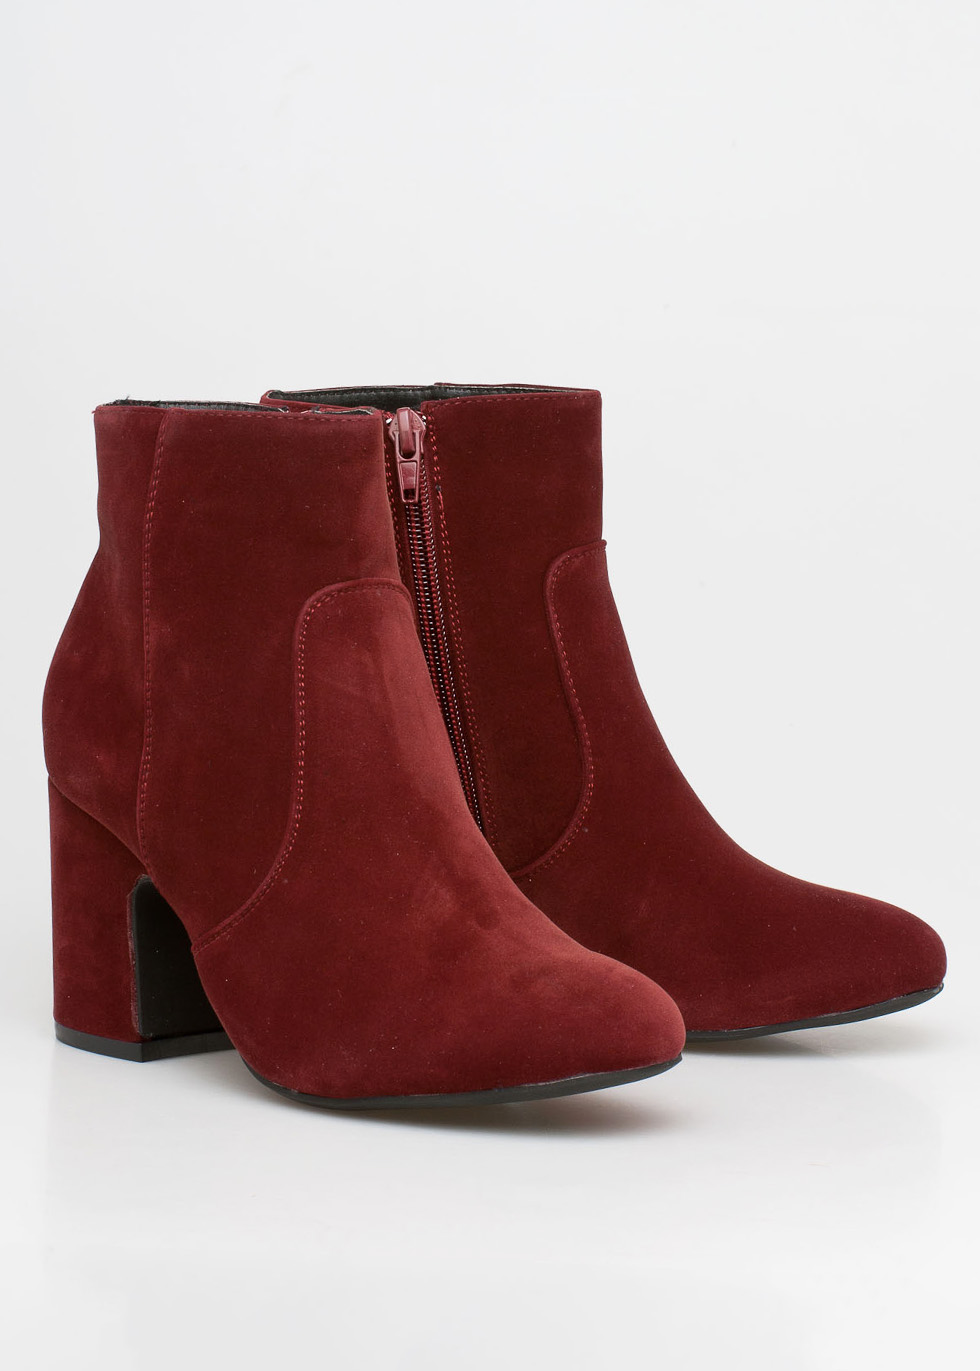 Kimmie velvet boot, μπορντό